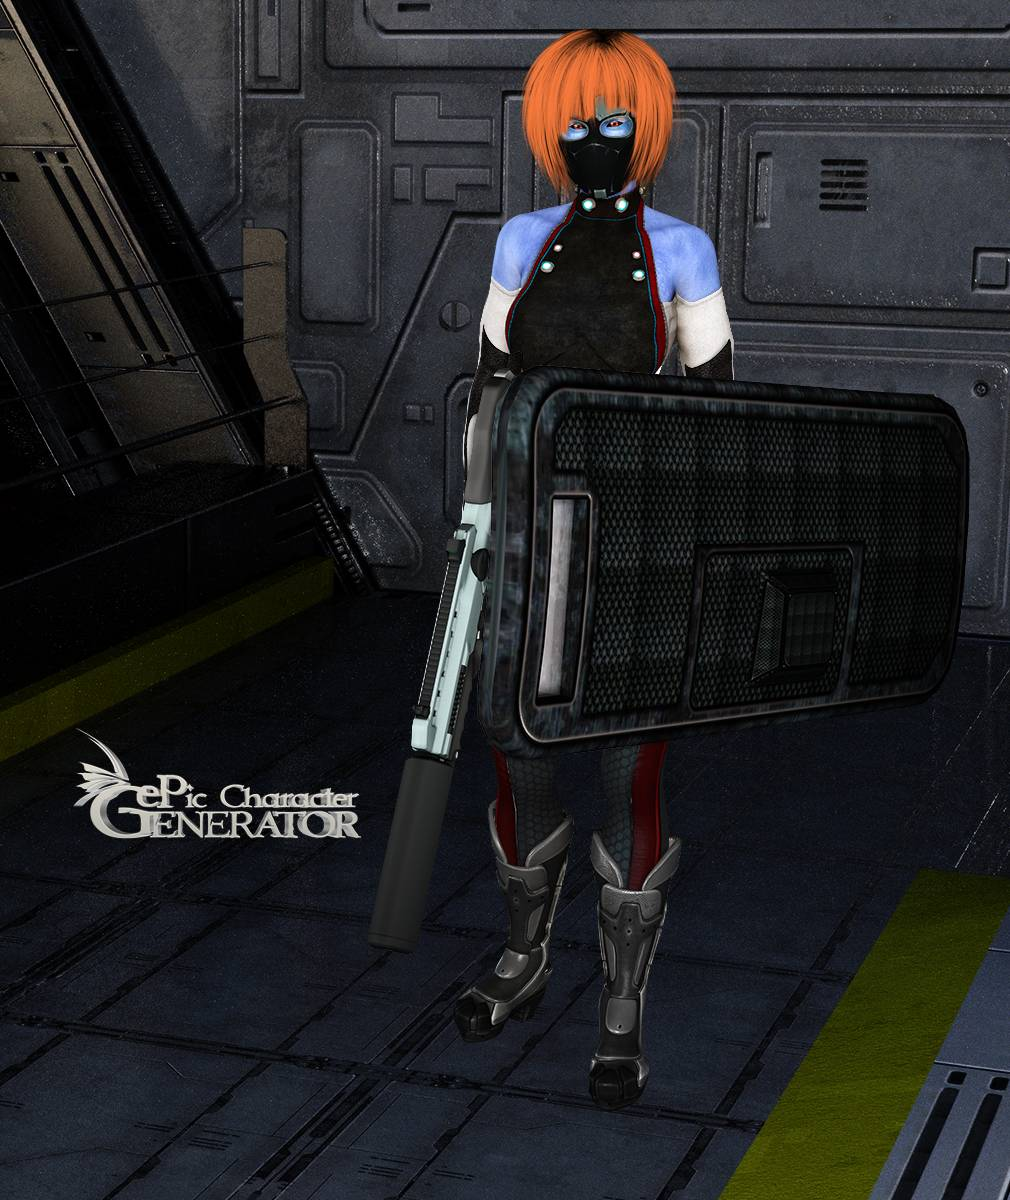 ePic Character Generator Season 2 Female Sci Fi Screenshot 08